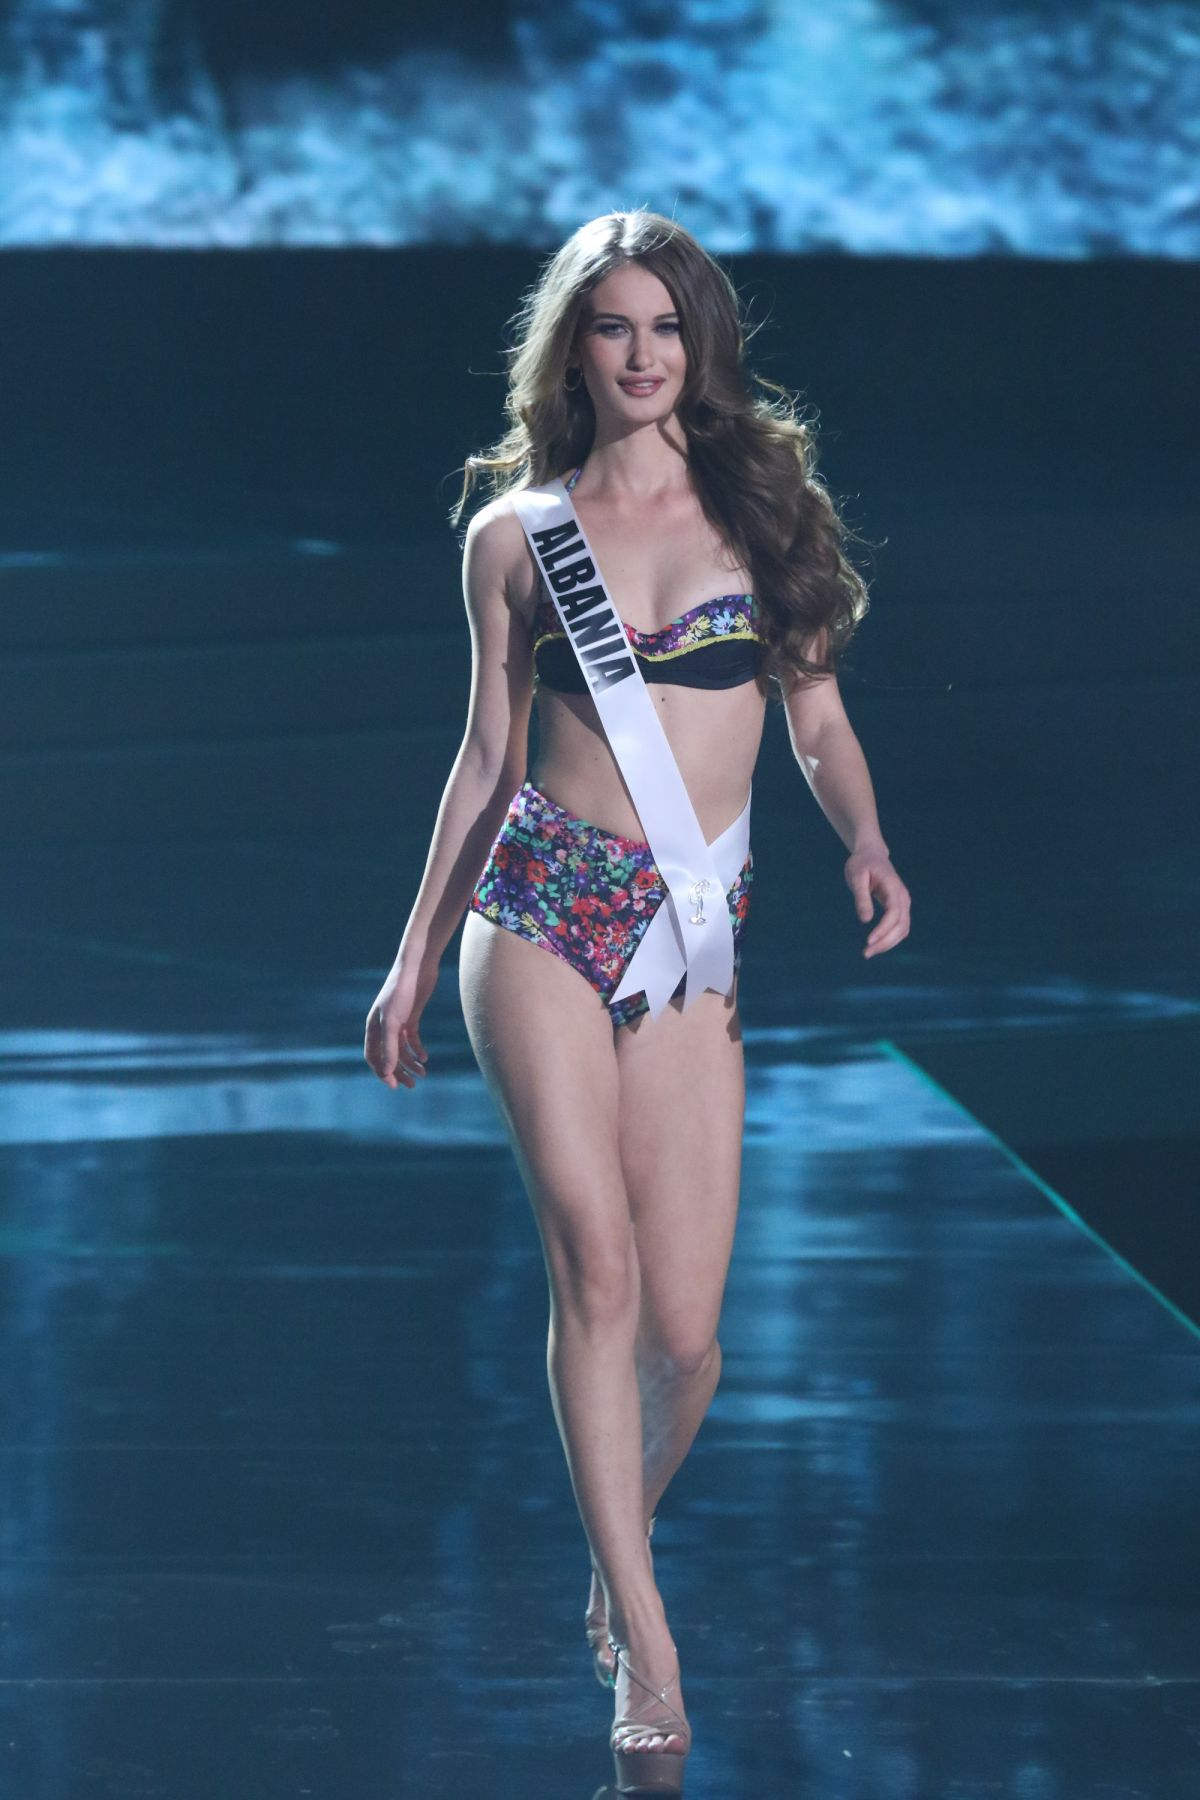 MEGI LUKA - Miss Universe 2015 Preliminary Round 12/16/2015